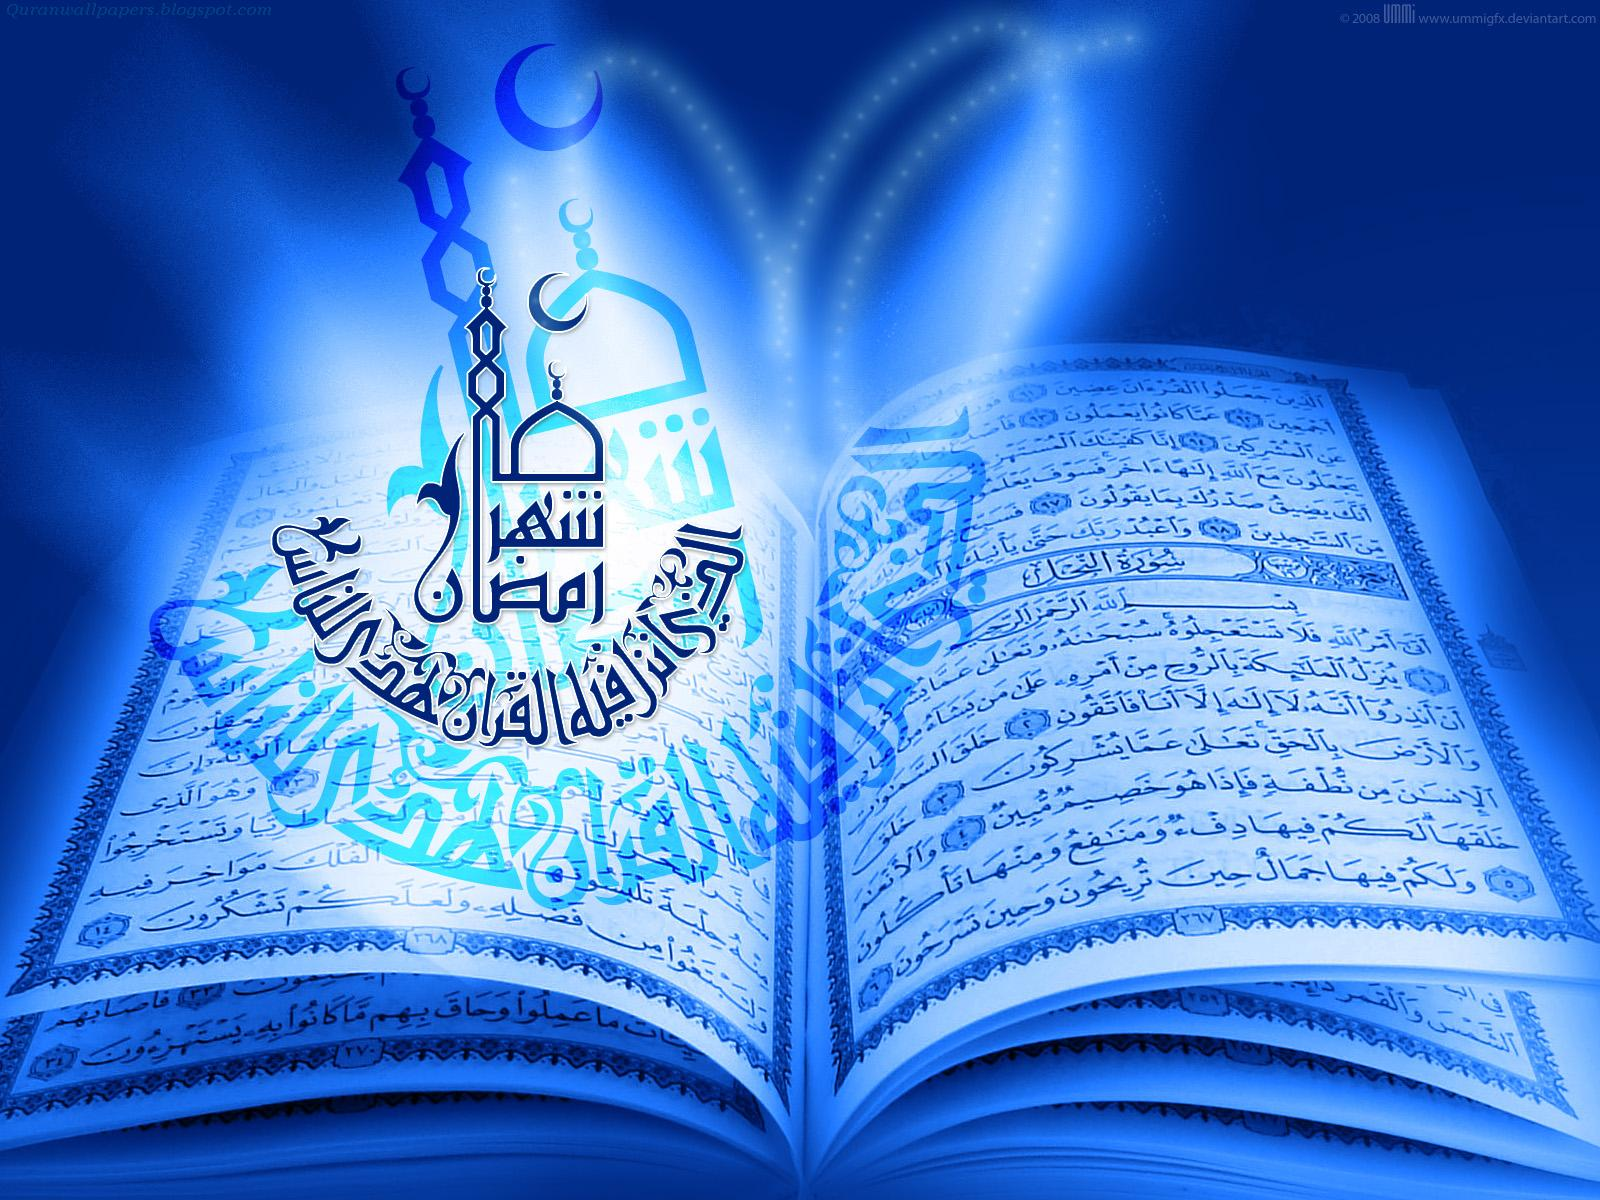 salaam ramadan islam quran wallpapers 2011